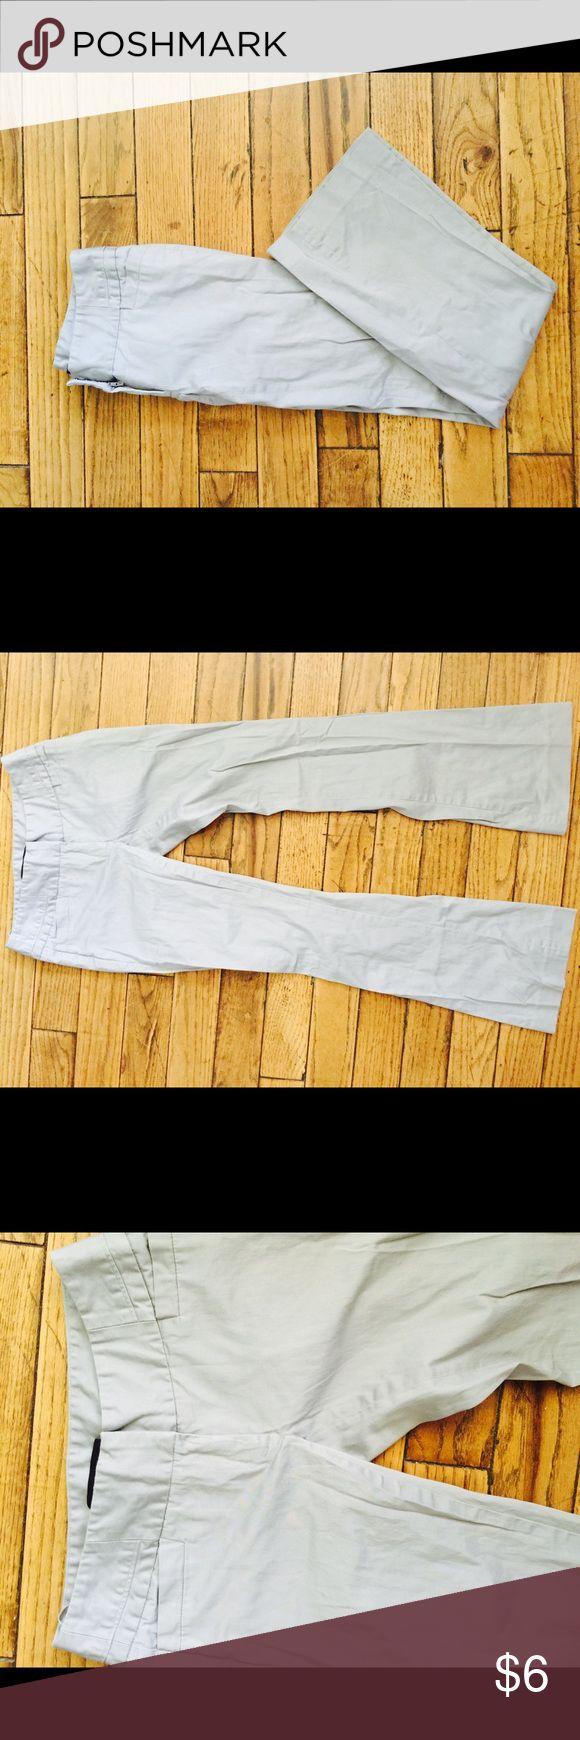 Grey dress pants Igor grey/silver women dress pants boot cut fit - like new condition Pants Boot Cut & Flare